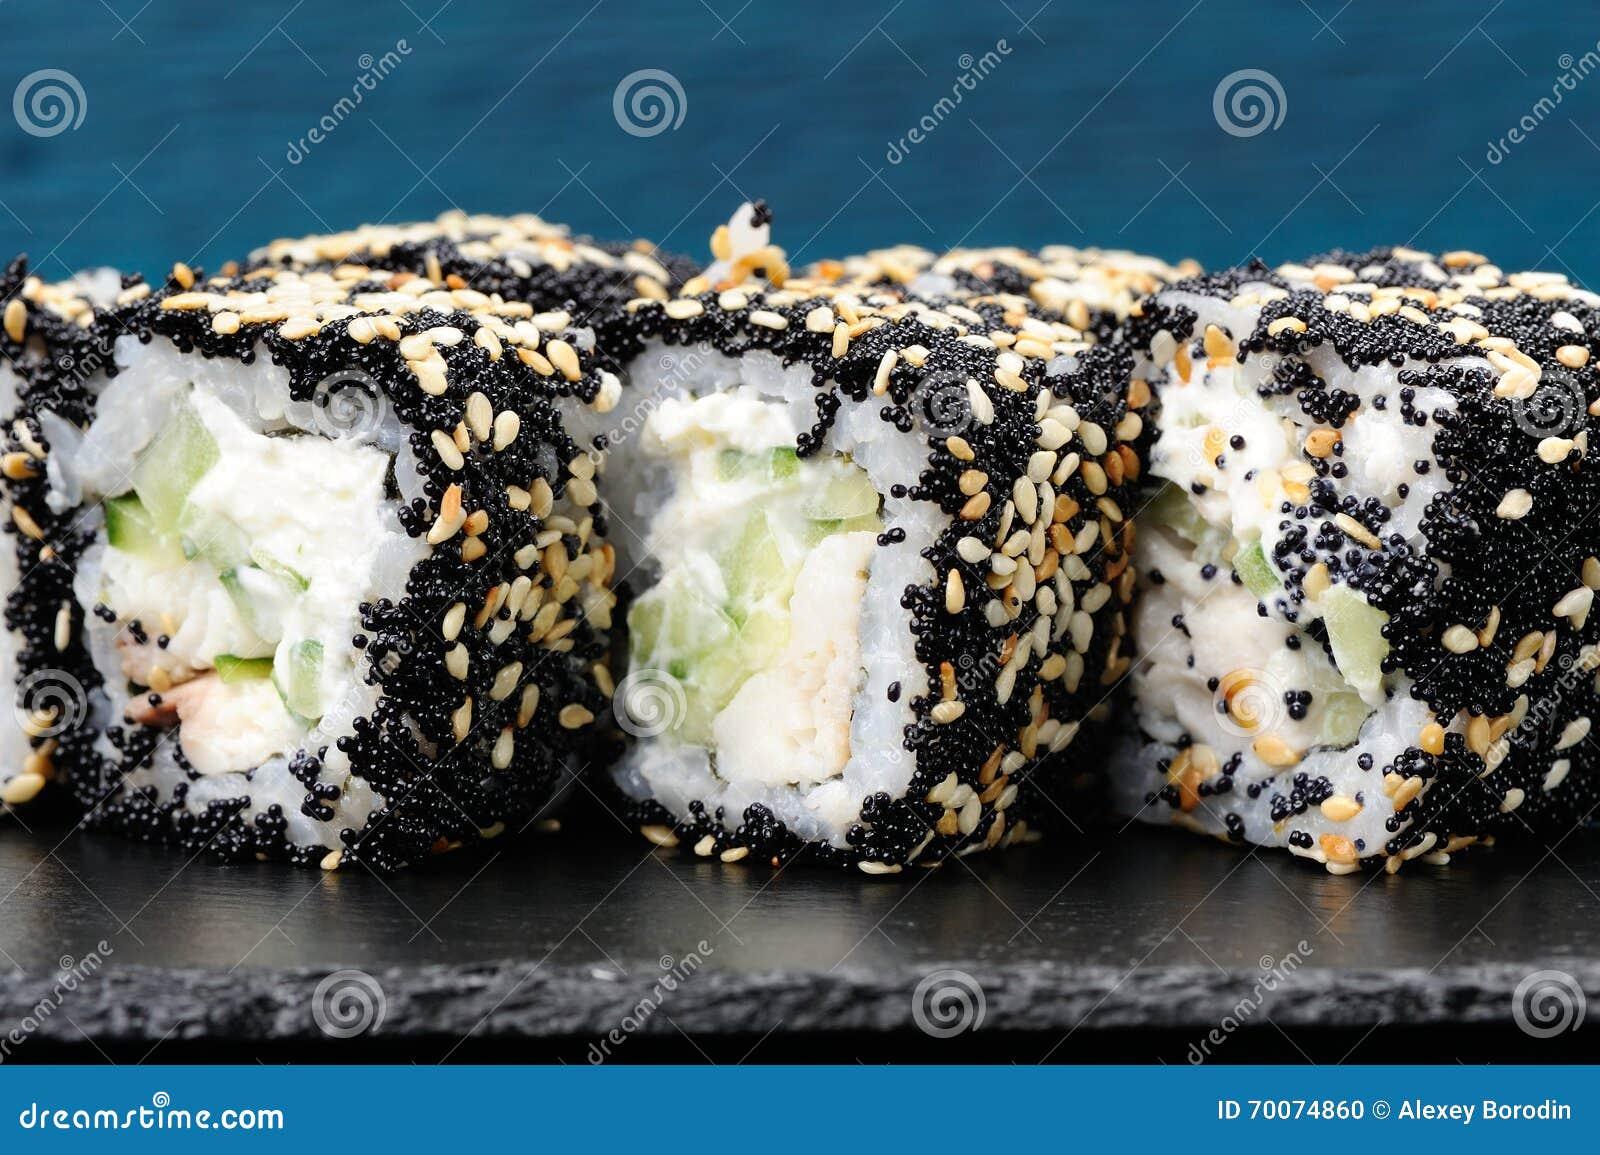 Homemade Sushi Rolls With Black Tobiko Sesame Seeds